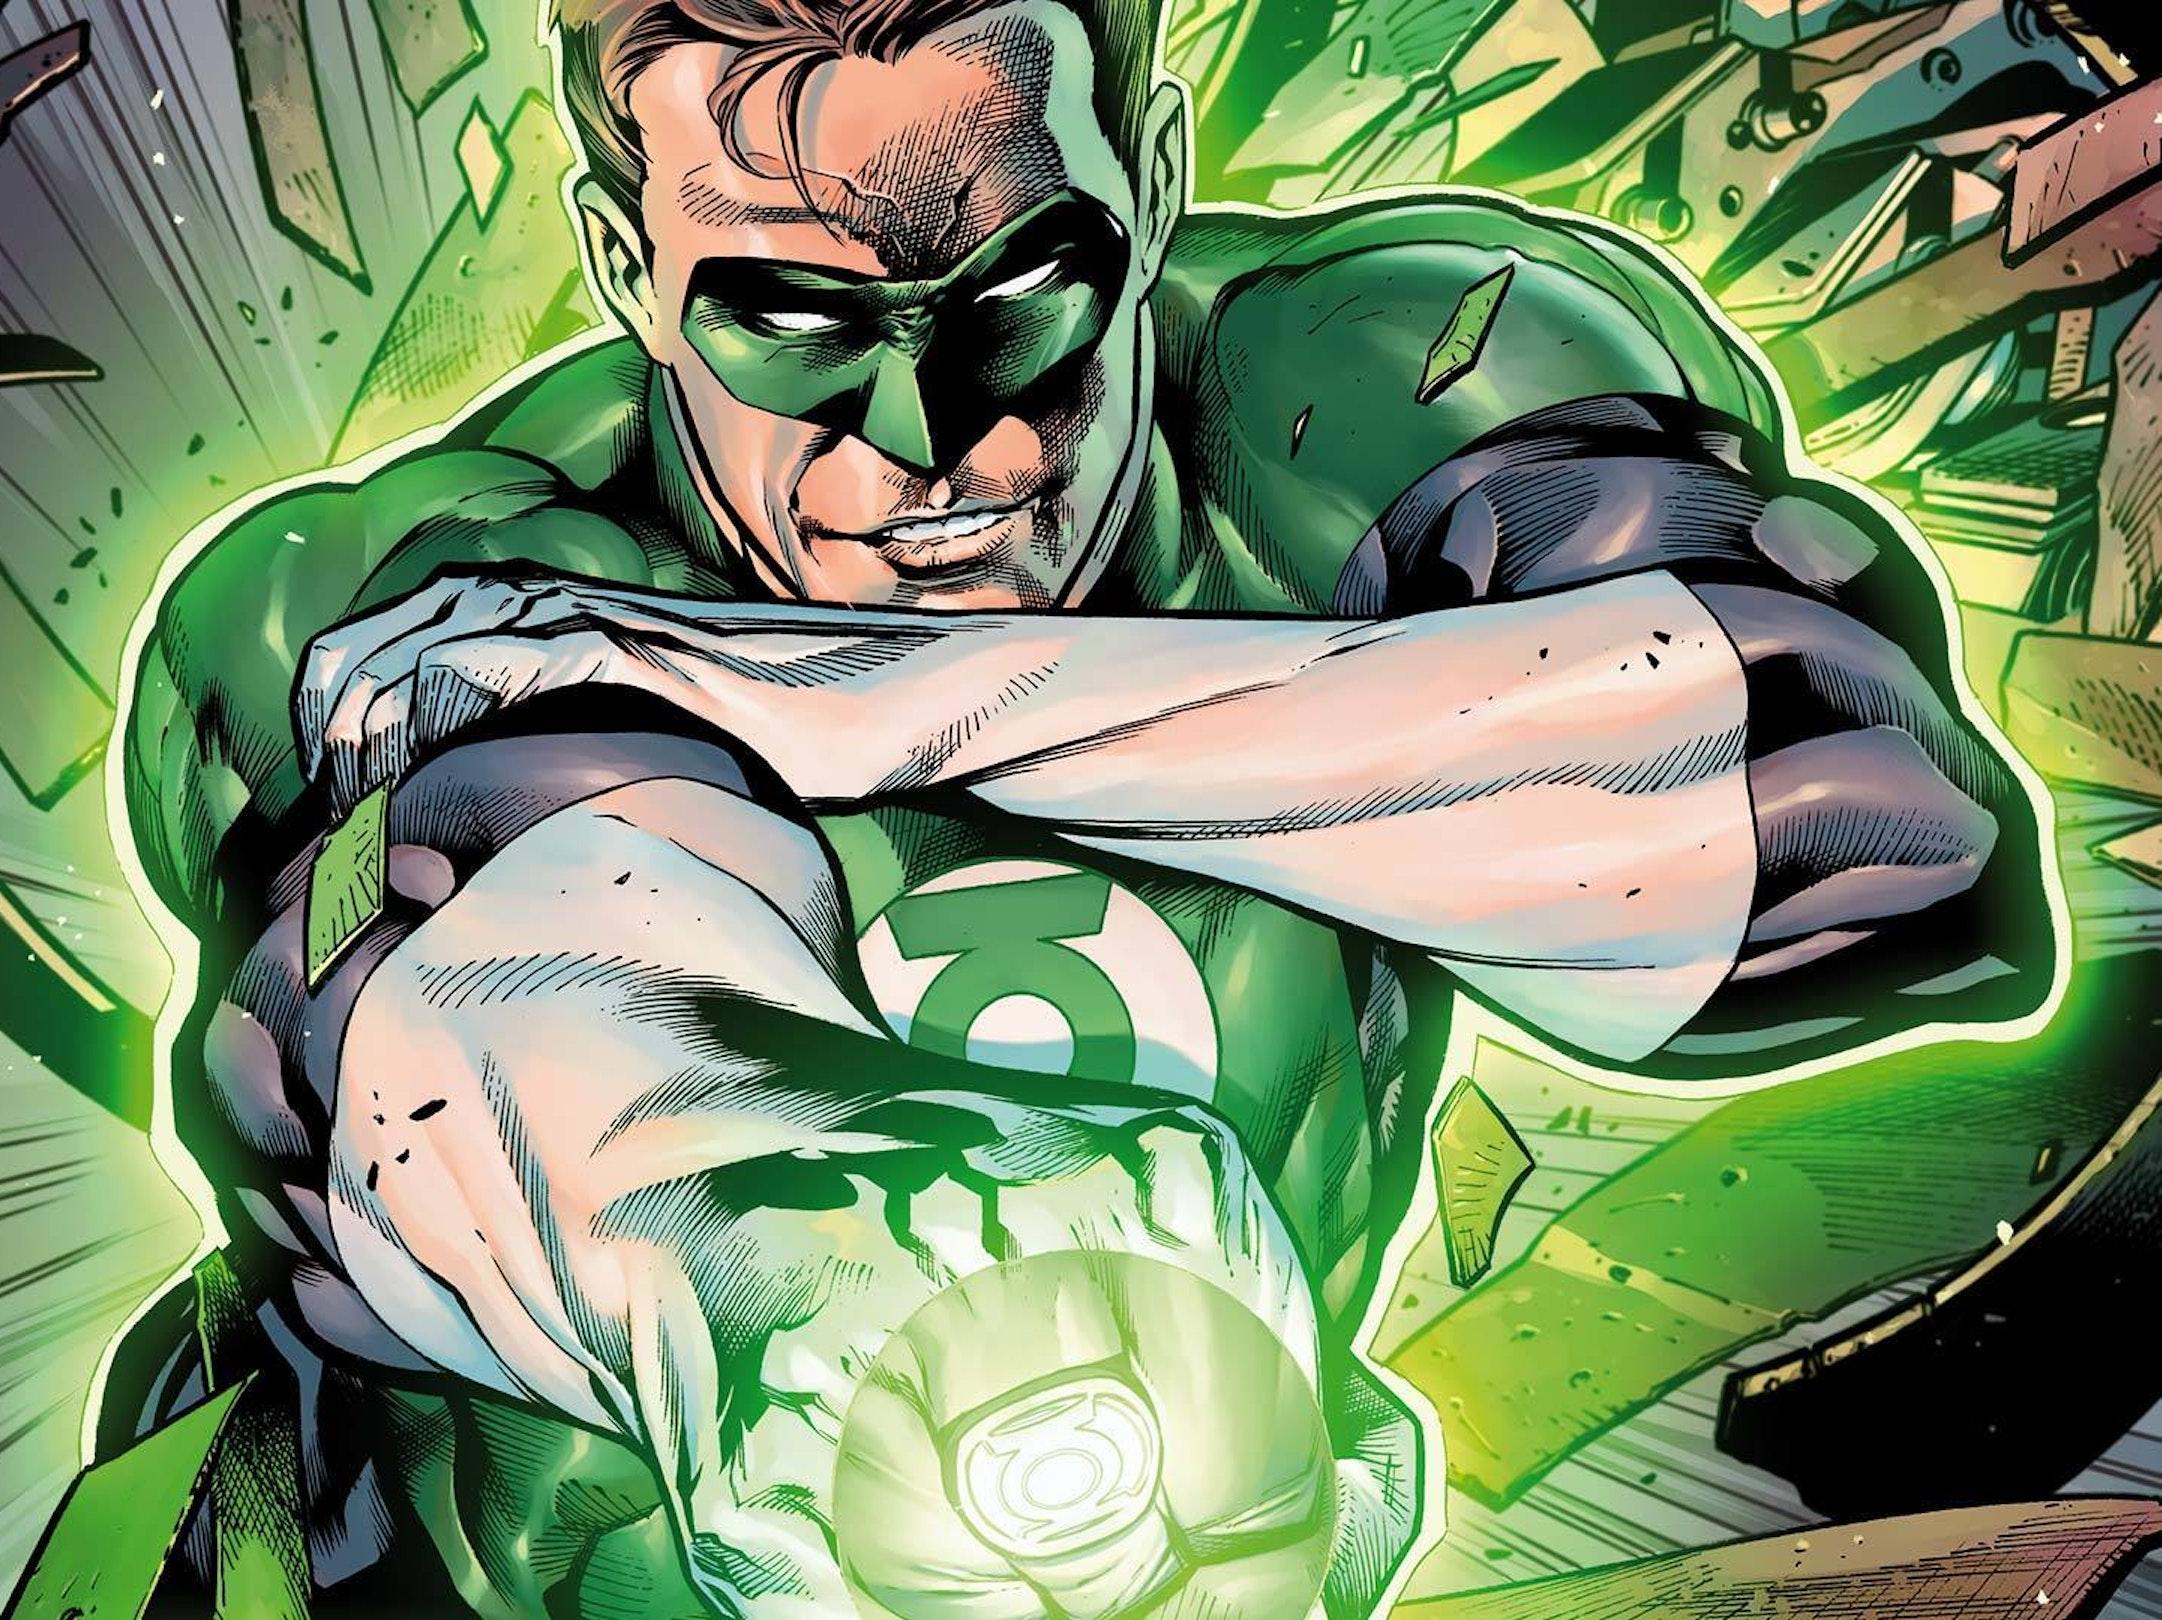 Even Ryan Reynolds Could Enjoy the New 'Green Lantern' Movie